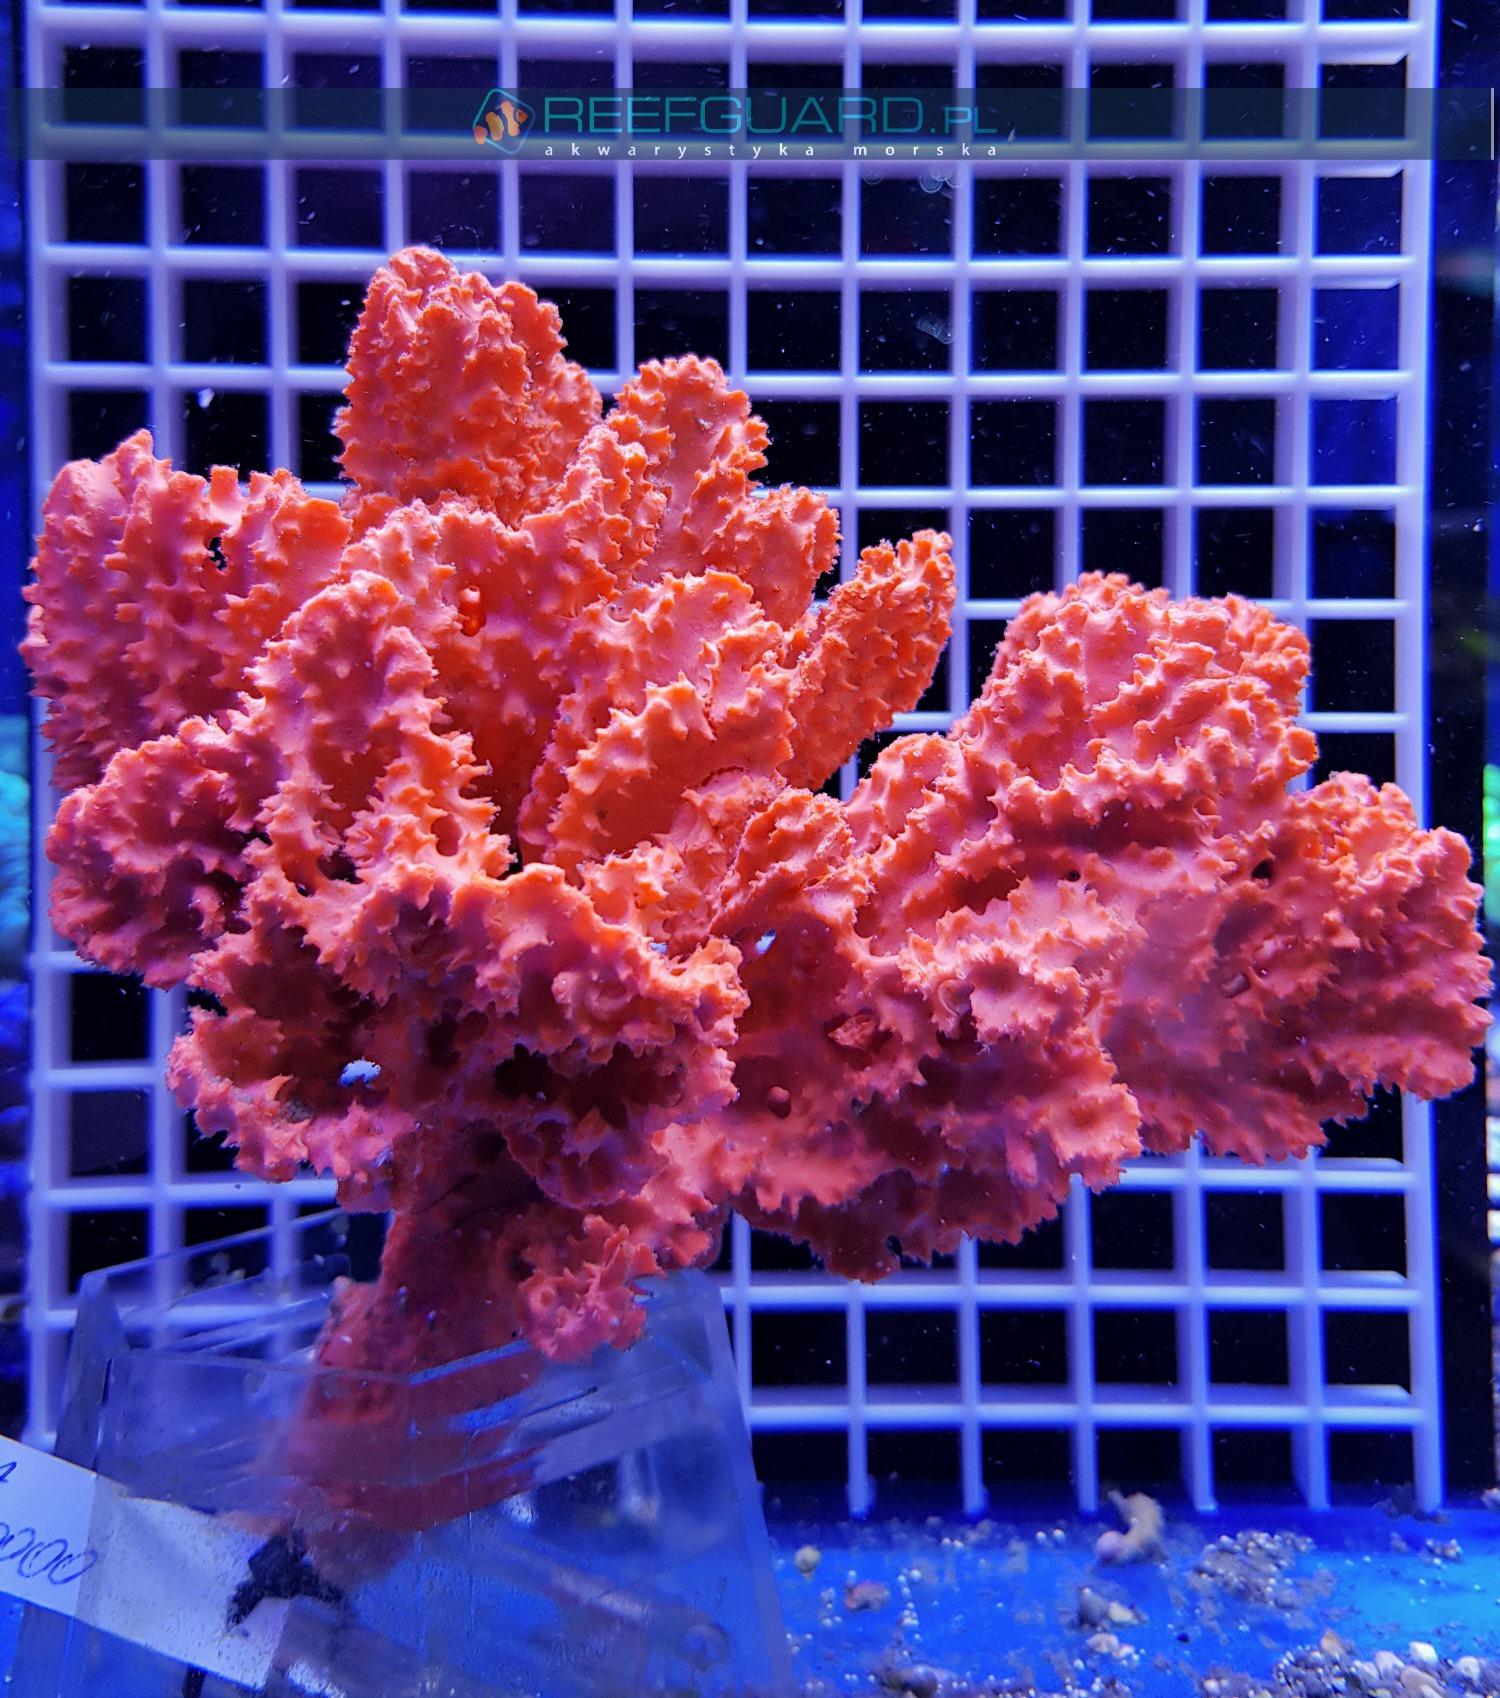 Gąbka morska RED Stylotella Aurantium WYSIWYG GABK0000 sponge szczecin reefguard